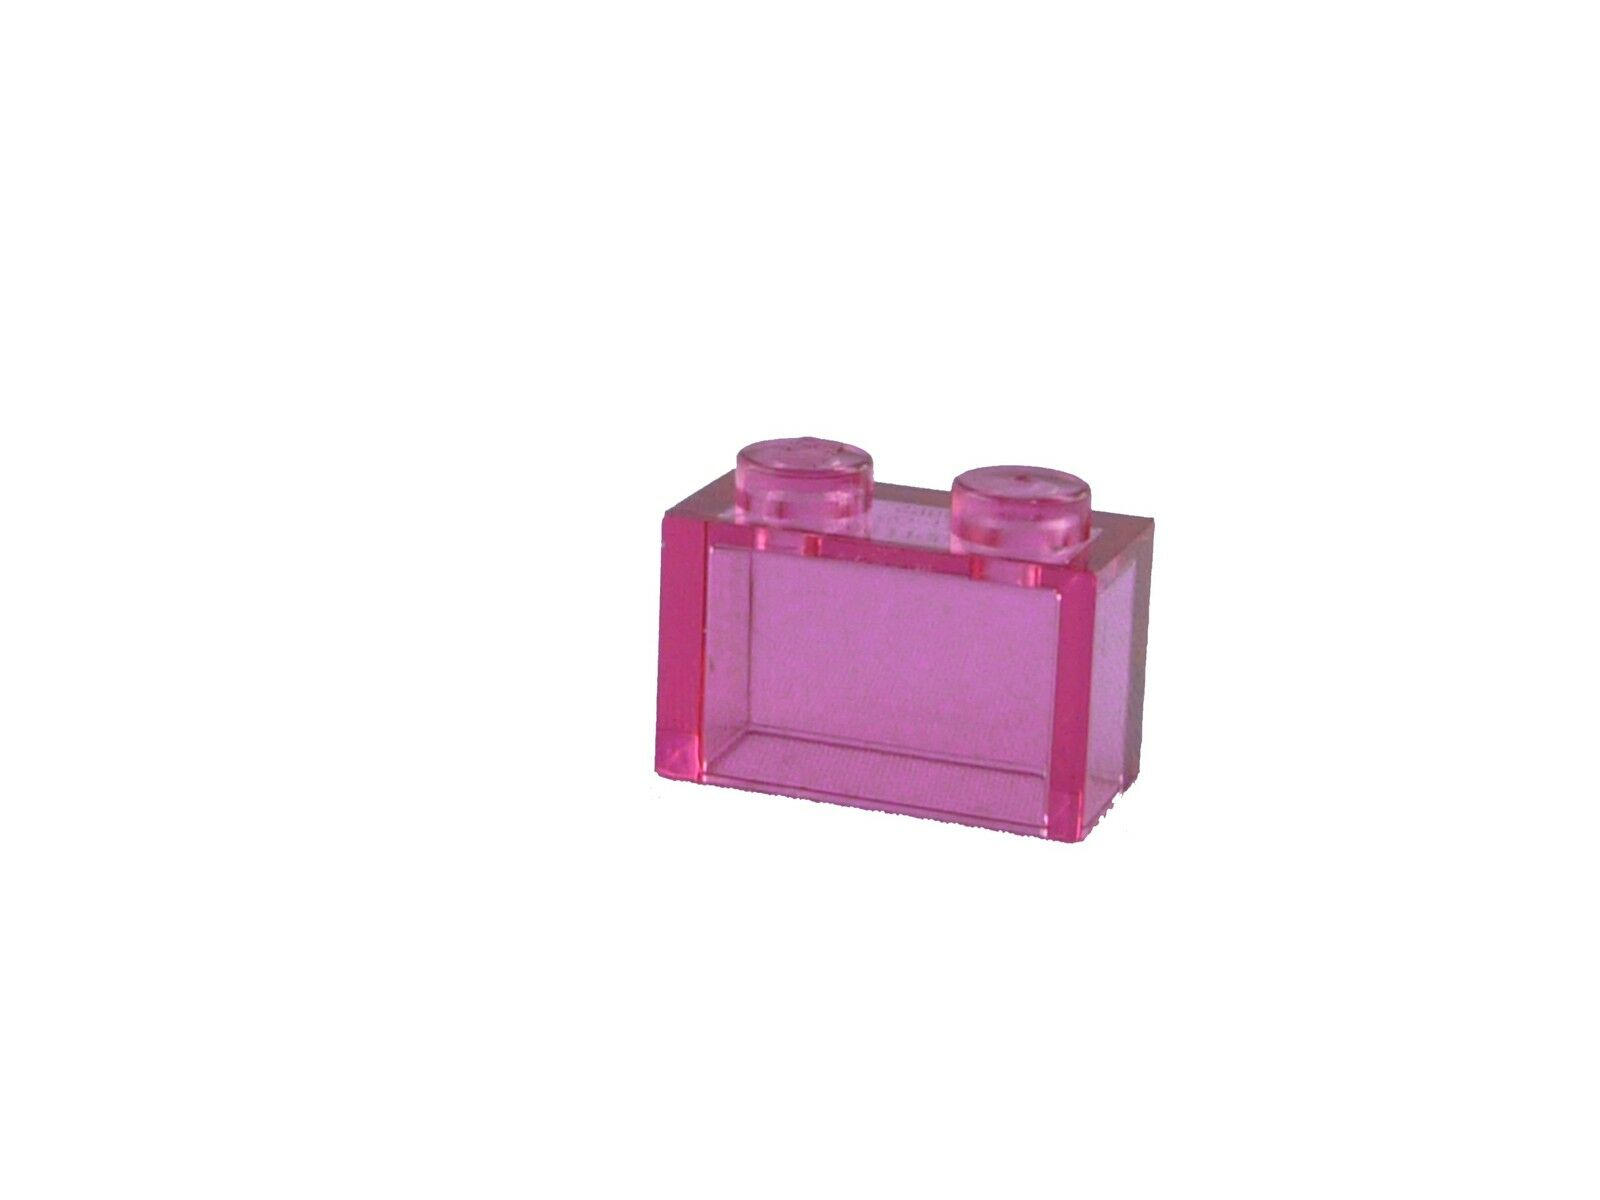 Lego New 50 Trans-Dark Pink Bricks 1 x 1 Transparent Building Blocks